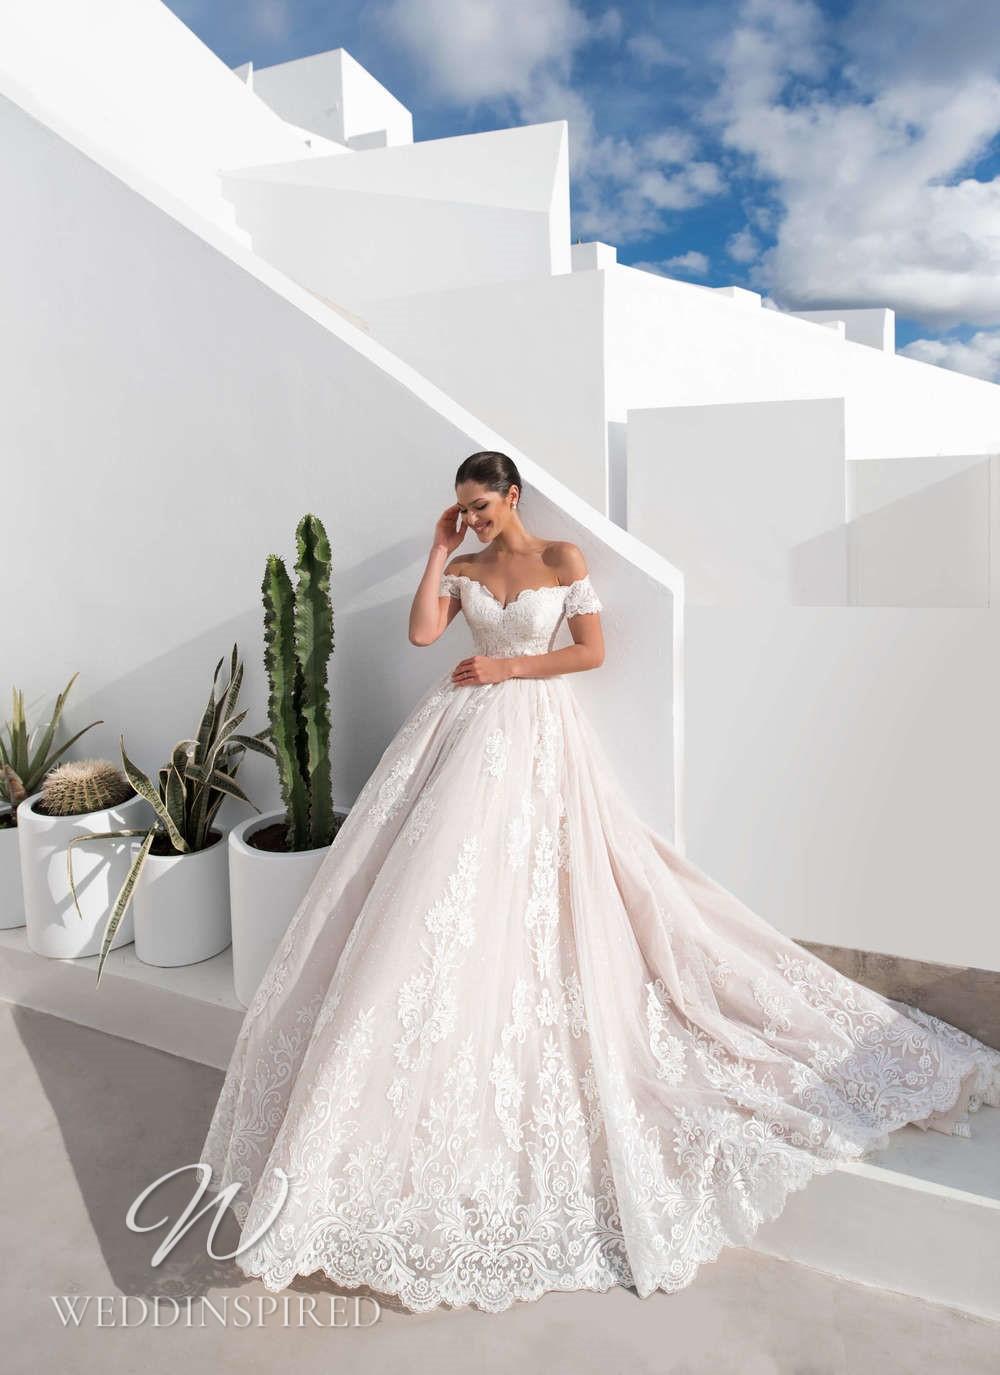 A Blunny 2021 blush lace off the shoulder princess wedding dress